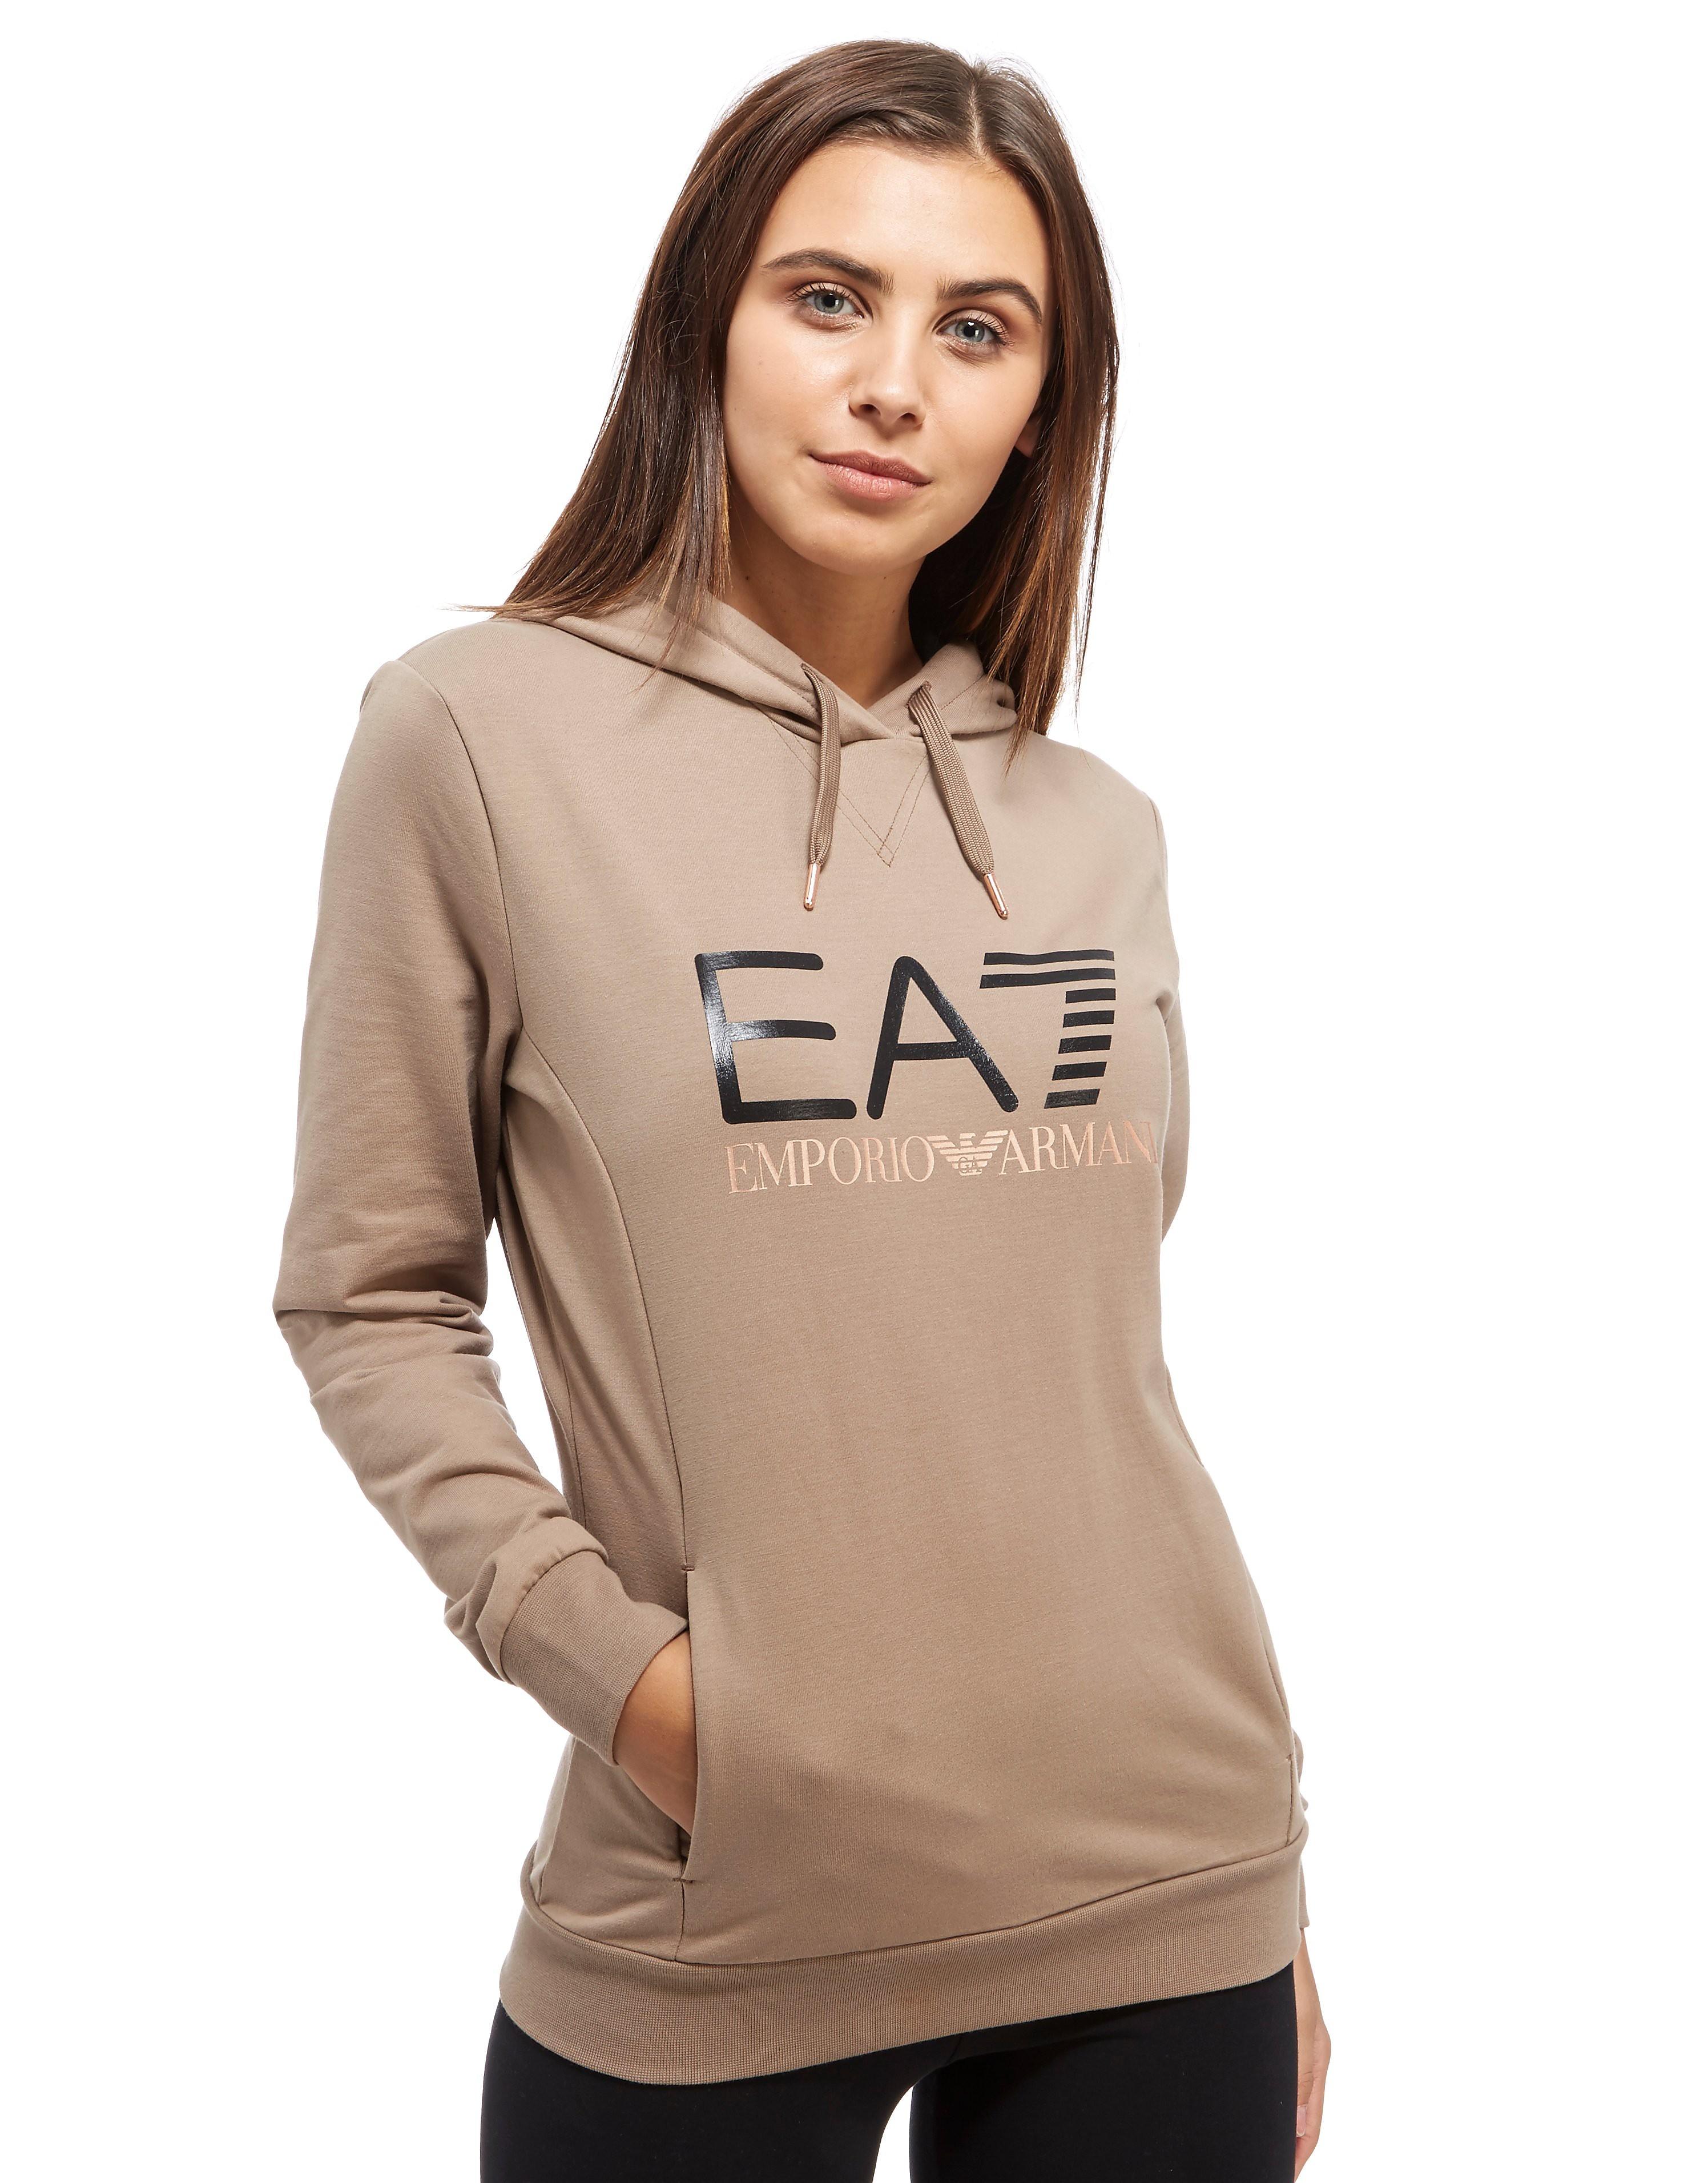 Emporio Armani EA7 Overhead Hoodie